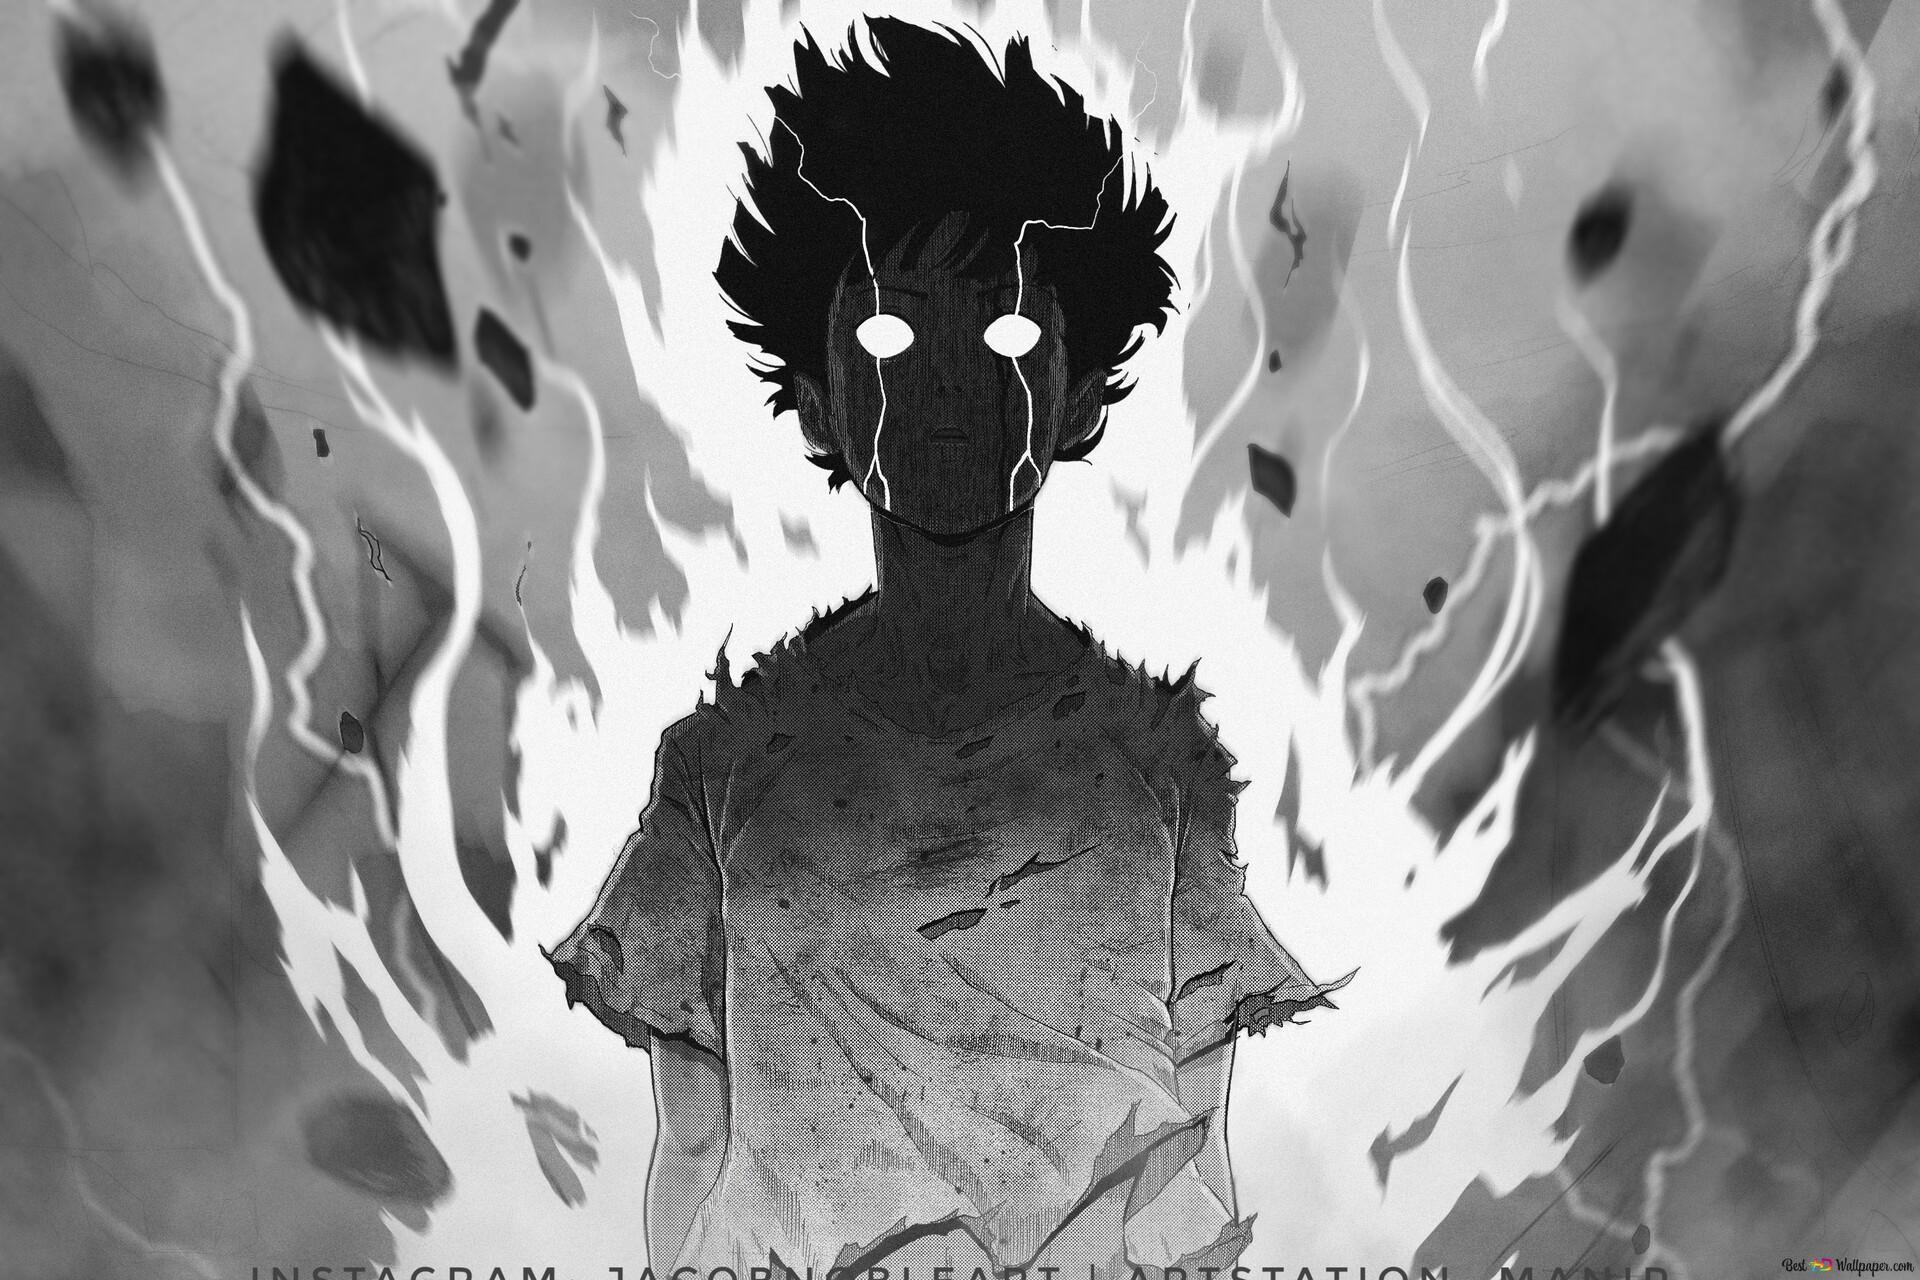 Mob Psycho 100 - Shigeo Kageyama 100